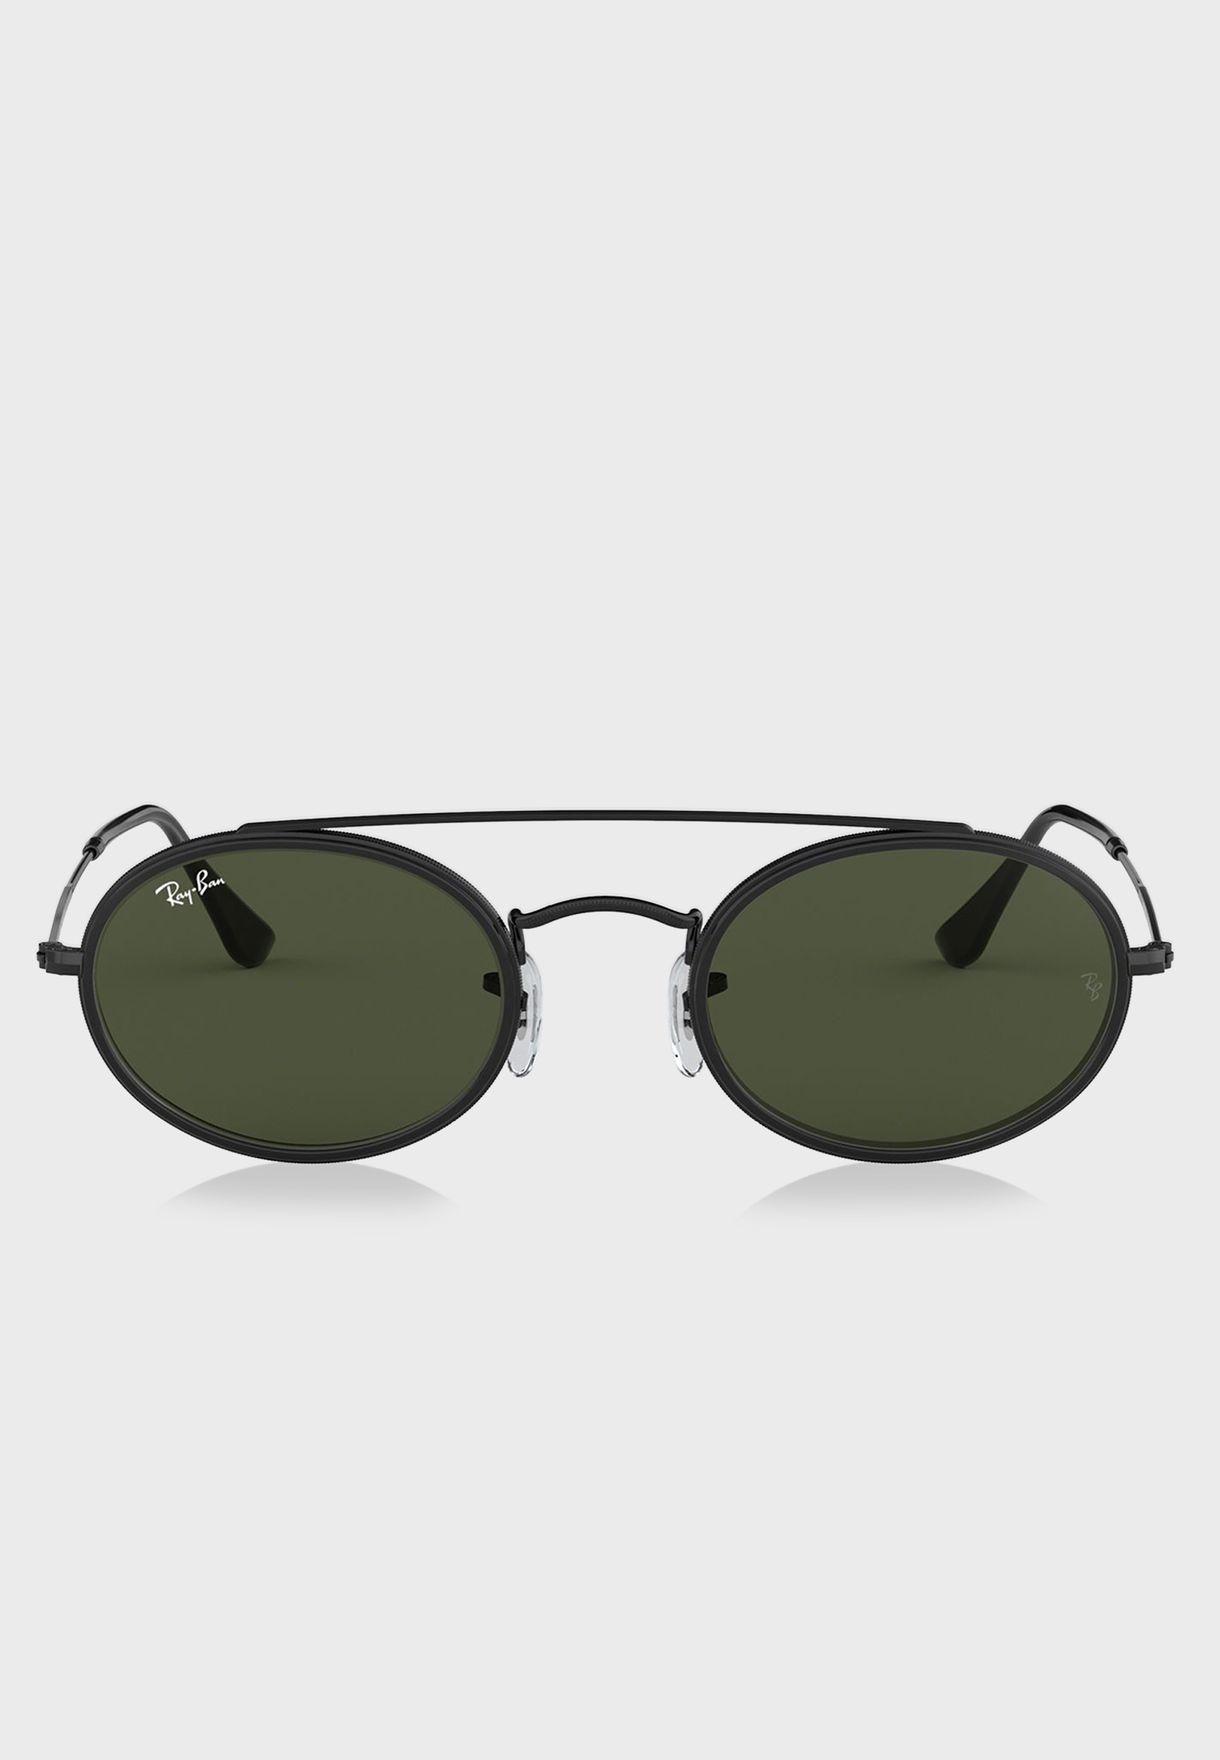 0RB3847N Double Bridge Sunglasses